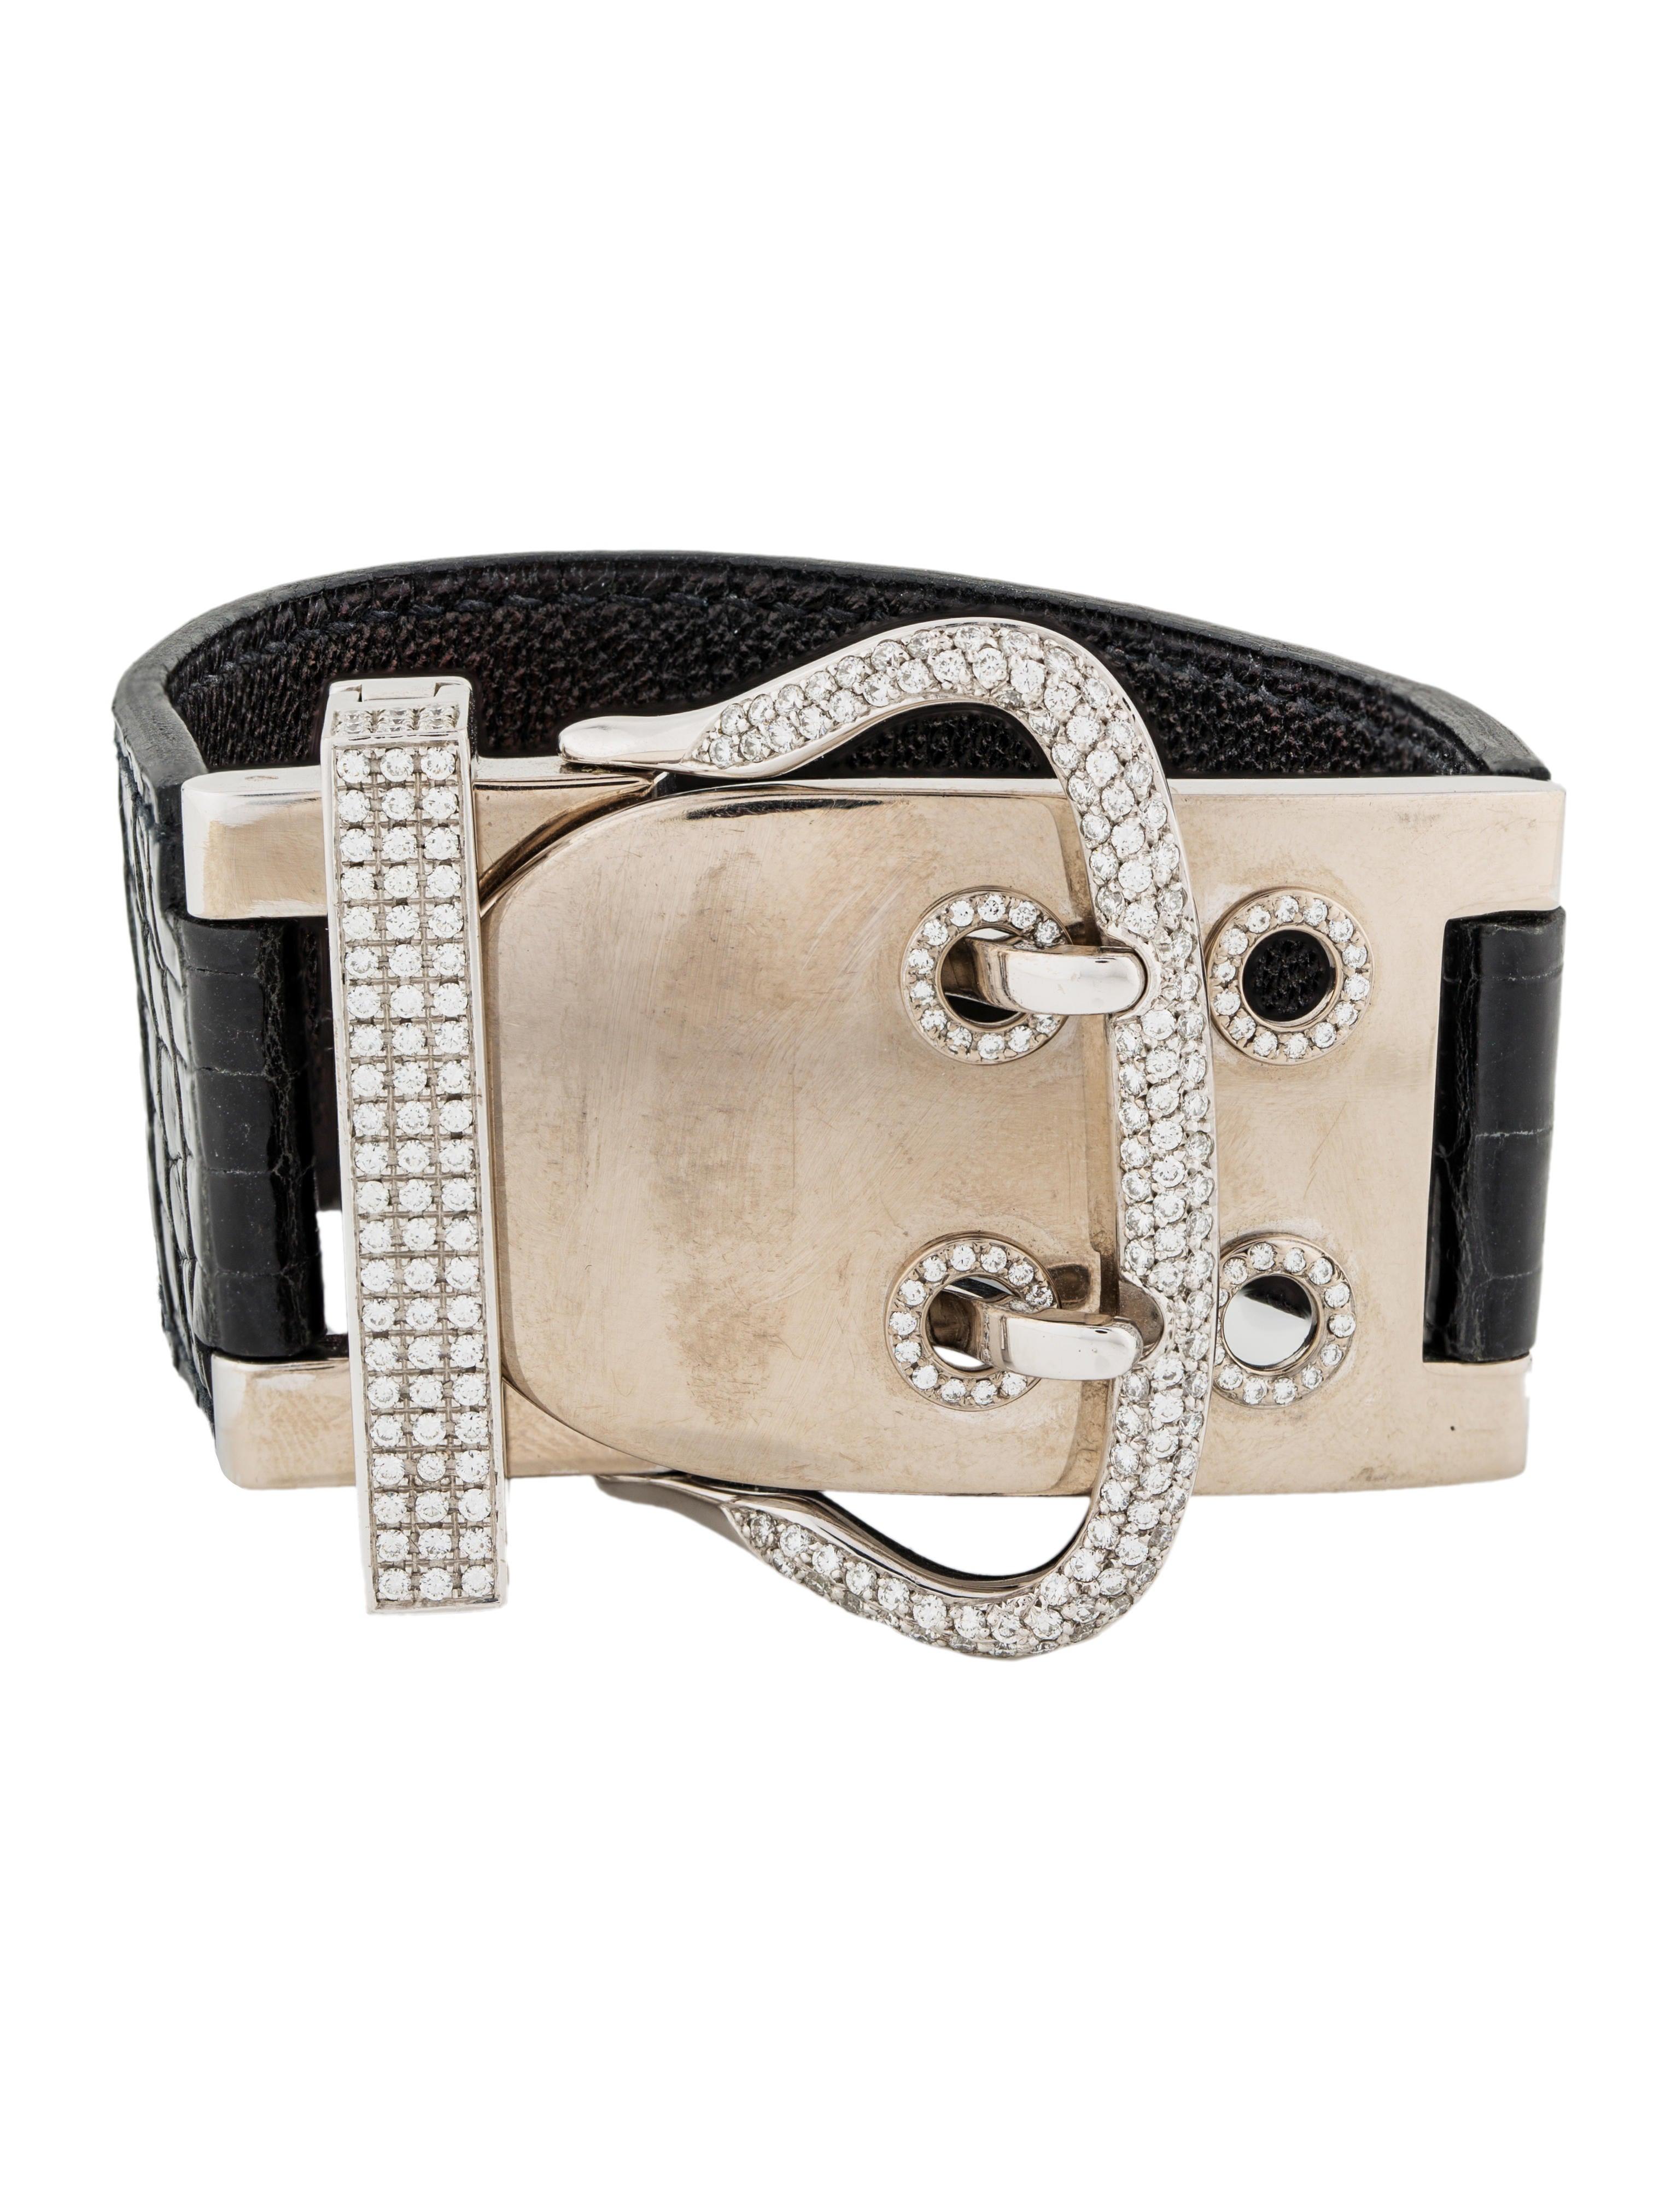 2967585cb829 Hermès 18K Diamond Boucle Sellier TGM Bracelet - Bracelets - HER134014    The RealReal